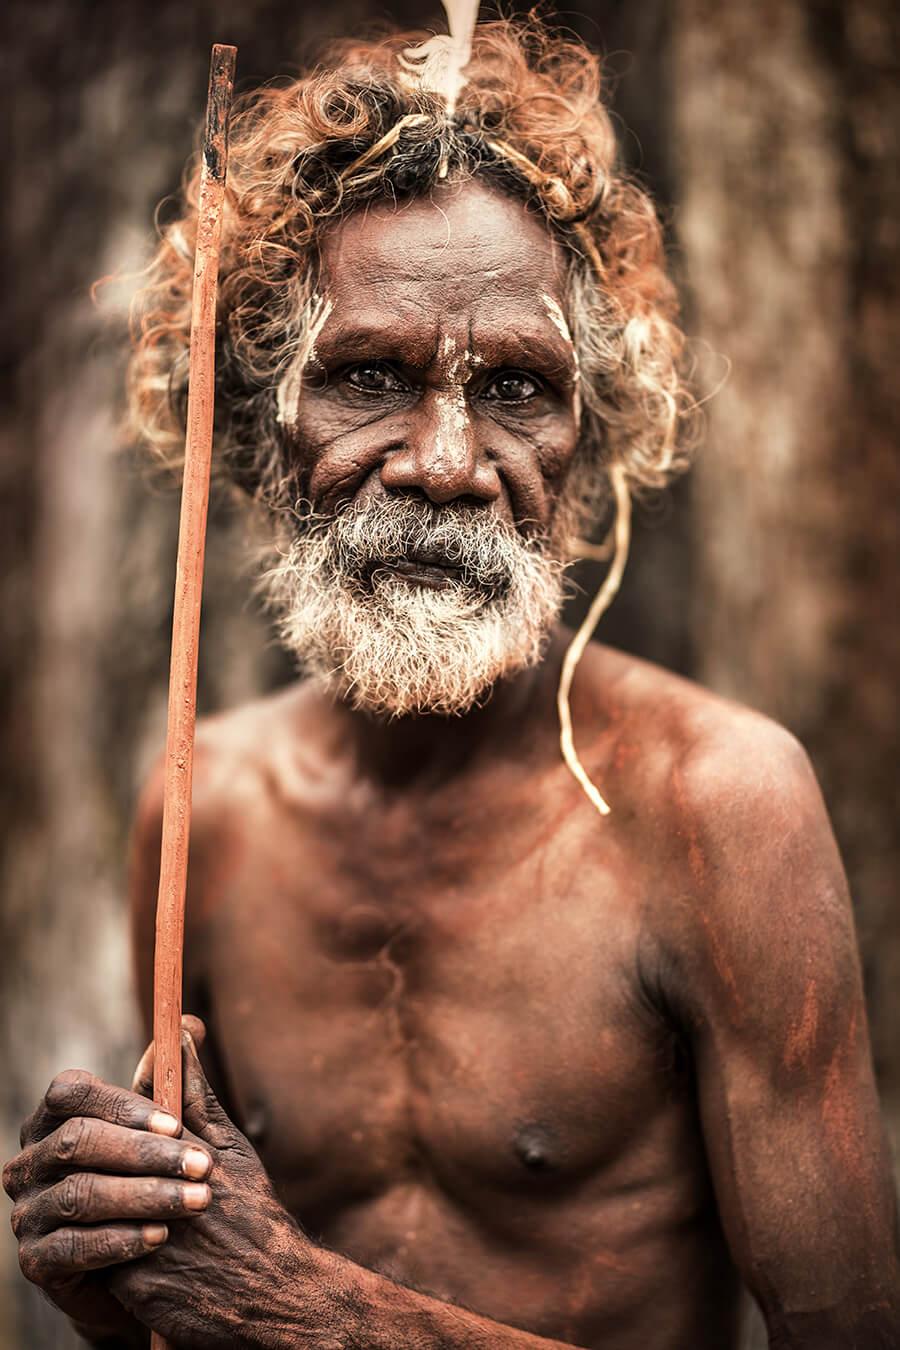 Старейшина из аборигенского поселения Пормпуурау, Австралия, п-ов Кейп-Йорк © Александр Химушин / The World In Faces